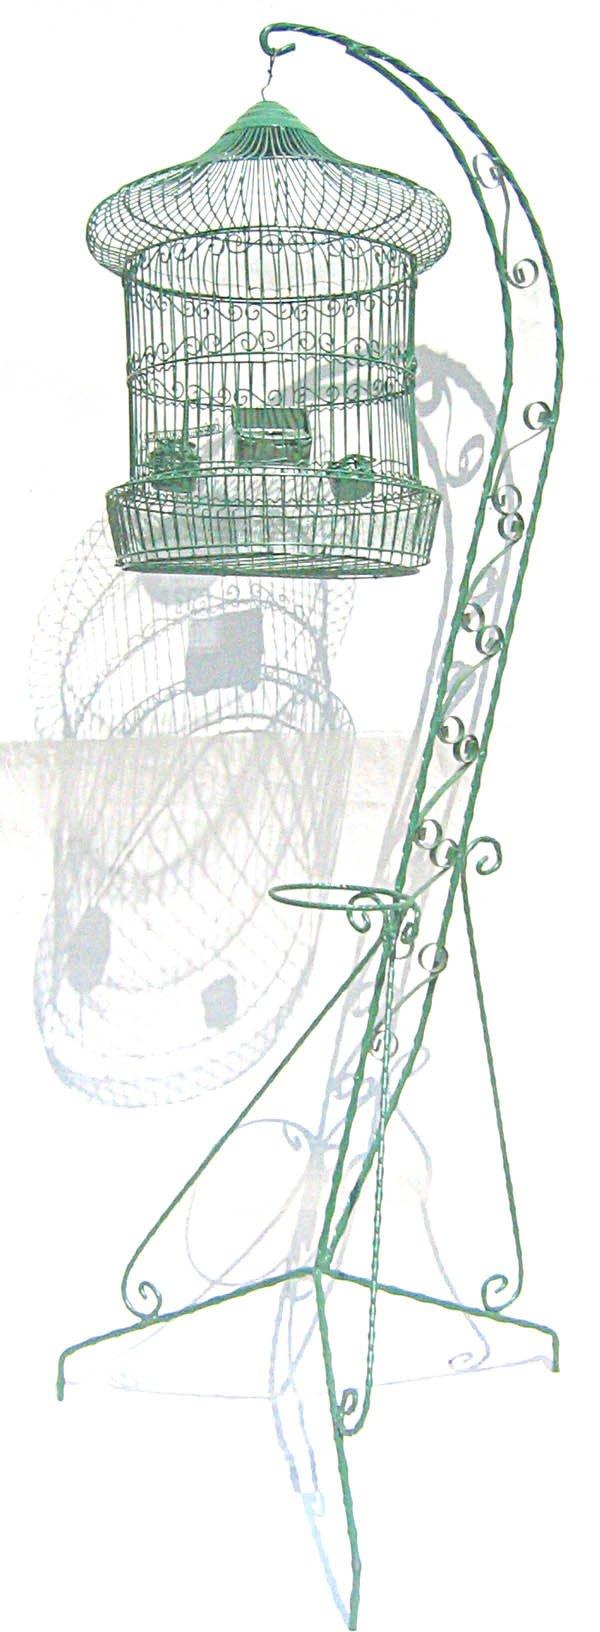 4009: Floor stand iron bird cage